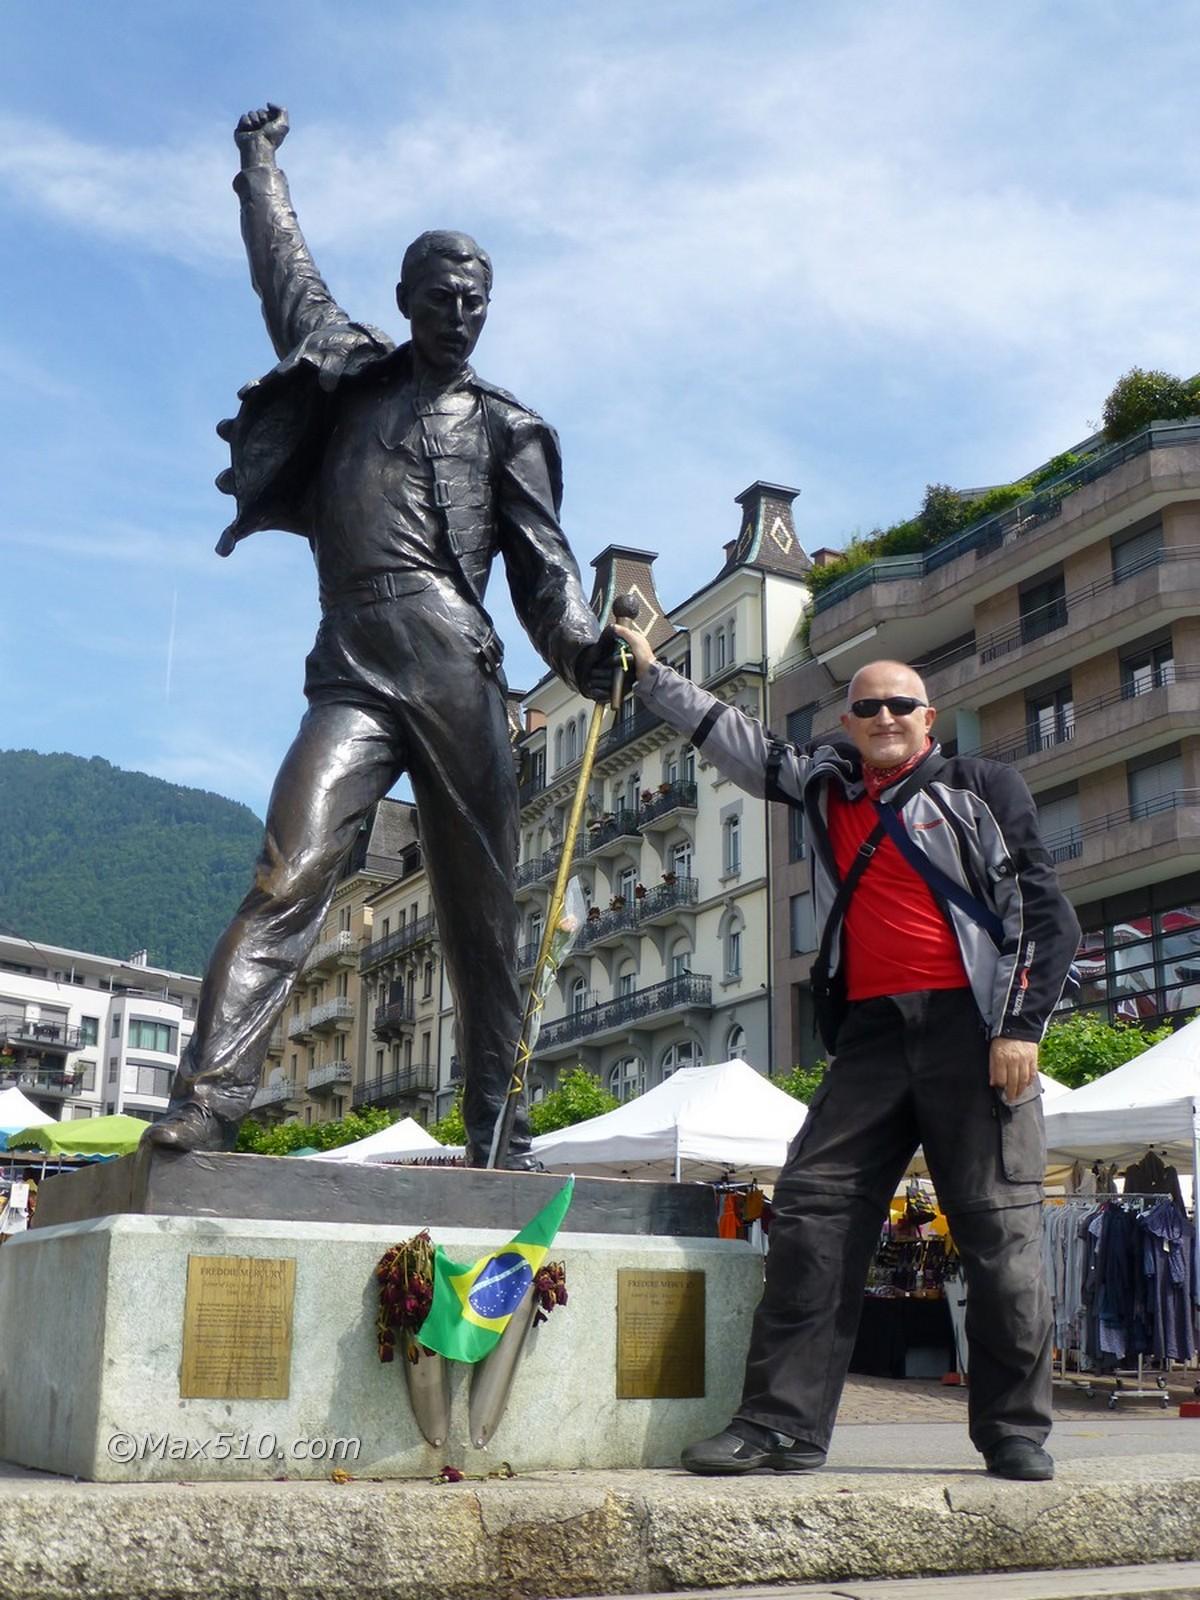 Da San Bernardo A Freddie Via Chillon Max510 S Blog